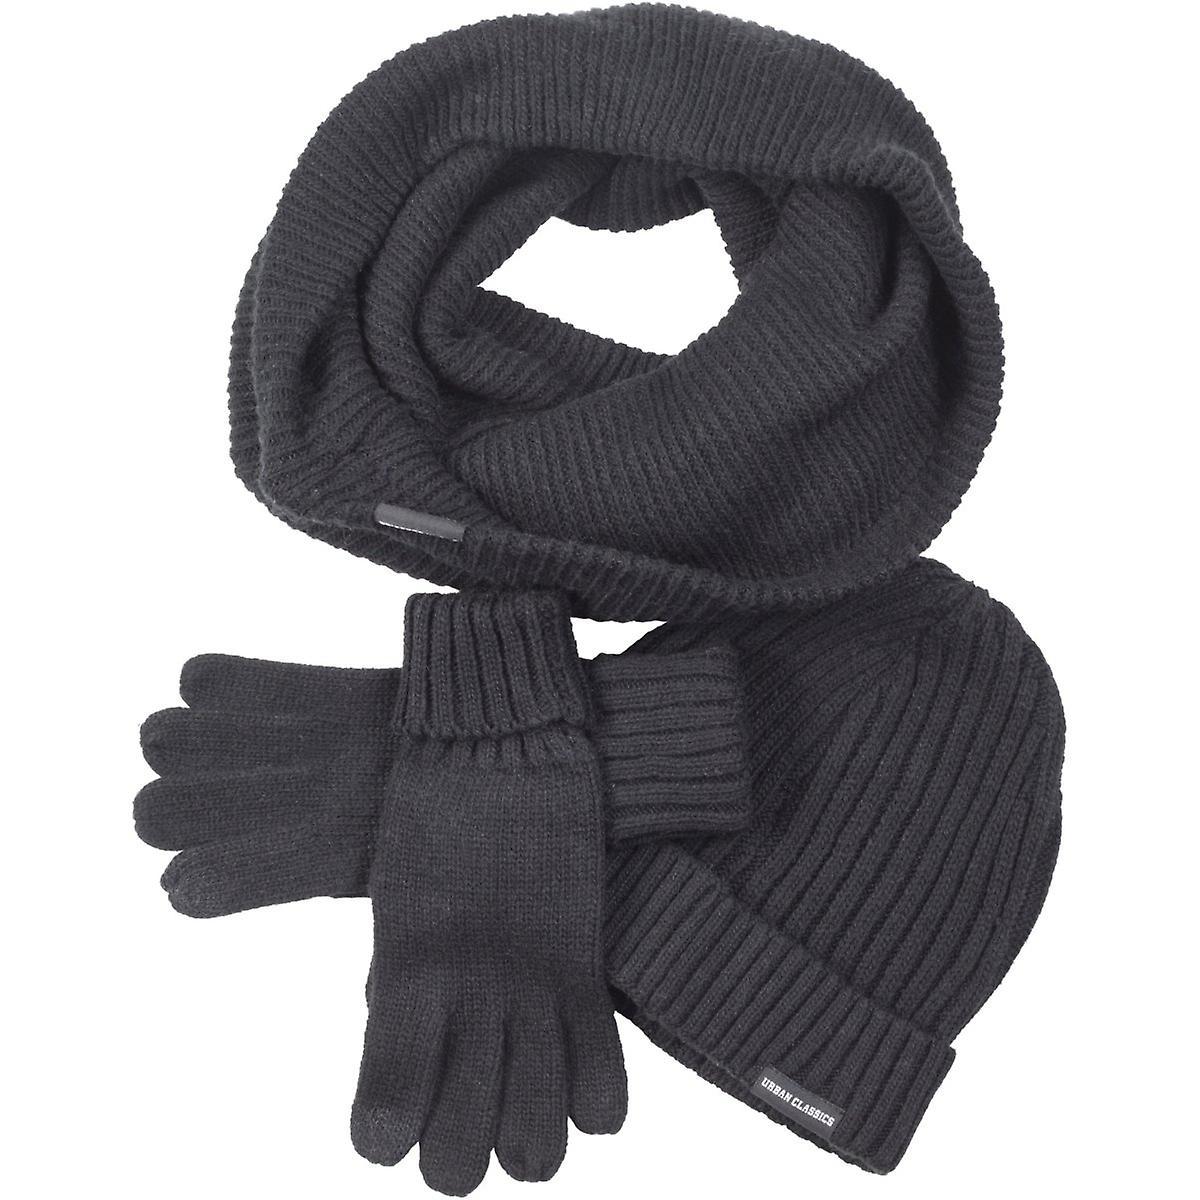 d91db637e4c Urban classics - WINTER SET-Hat scarf Gloves black